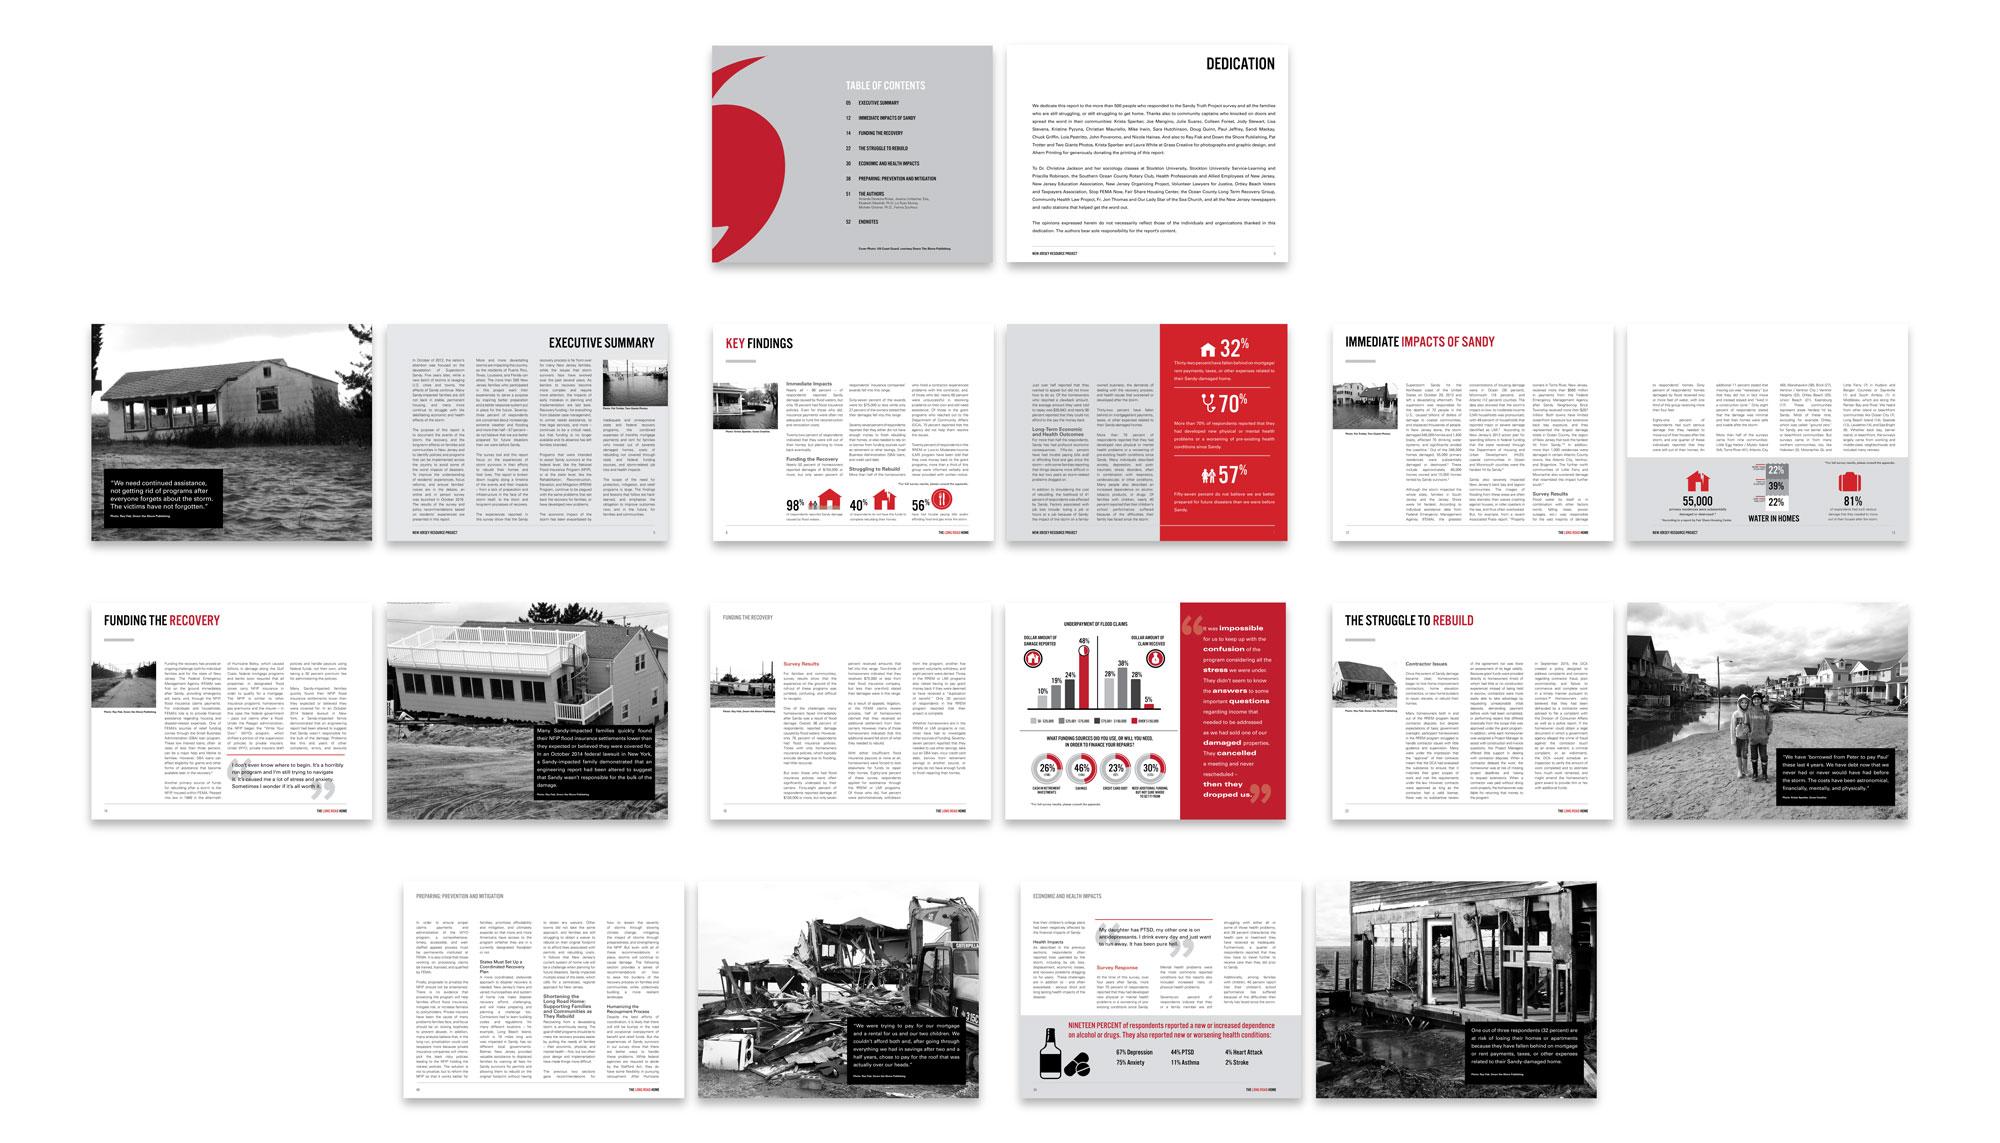 grass-creative-branding-identity-art-direction-nonprofit-report-design-NJOP.jpg